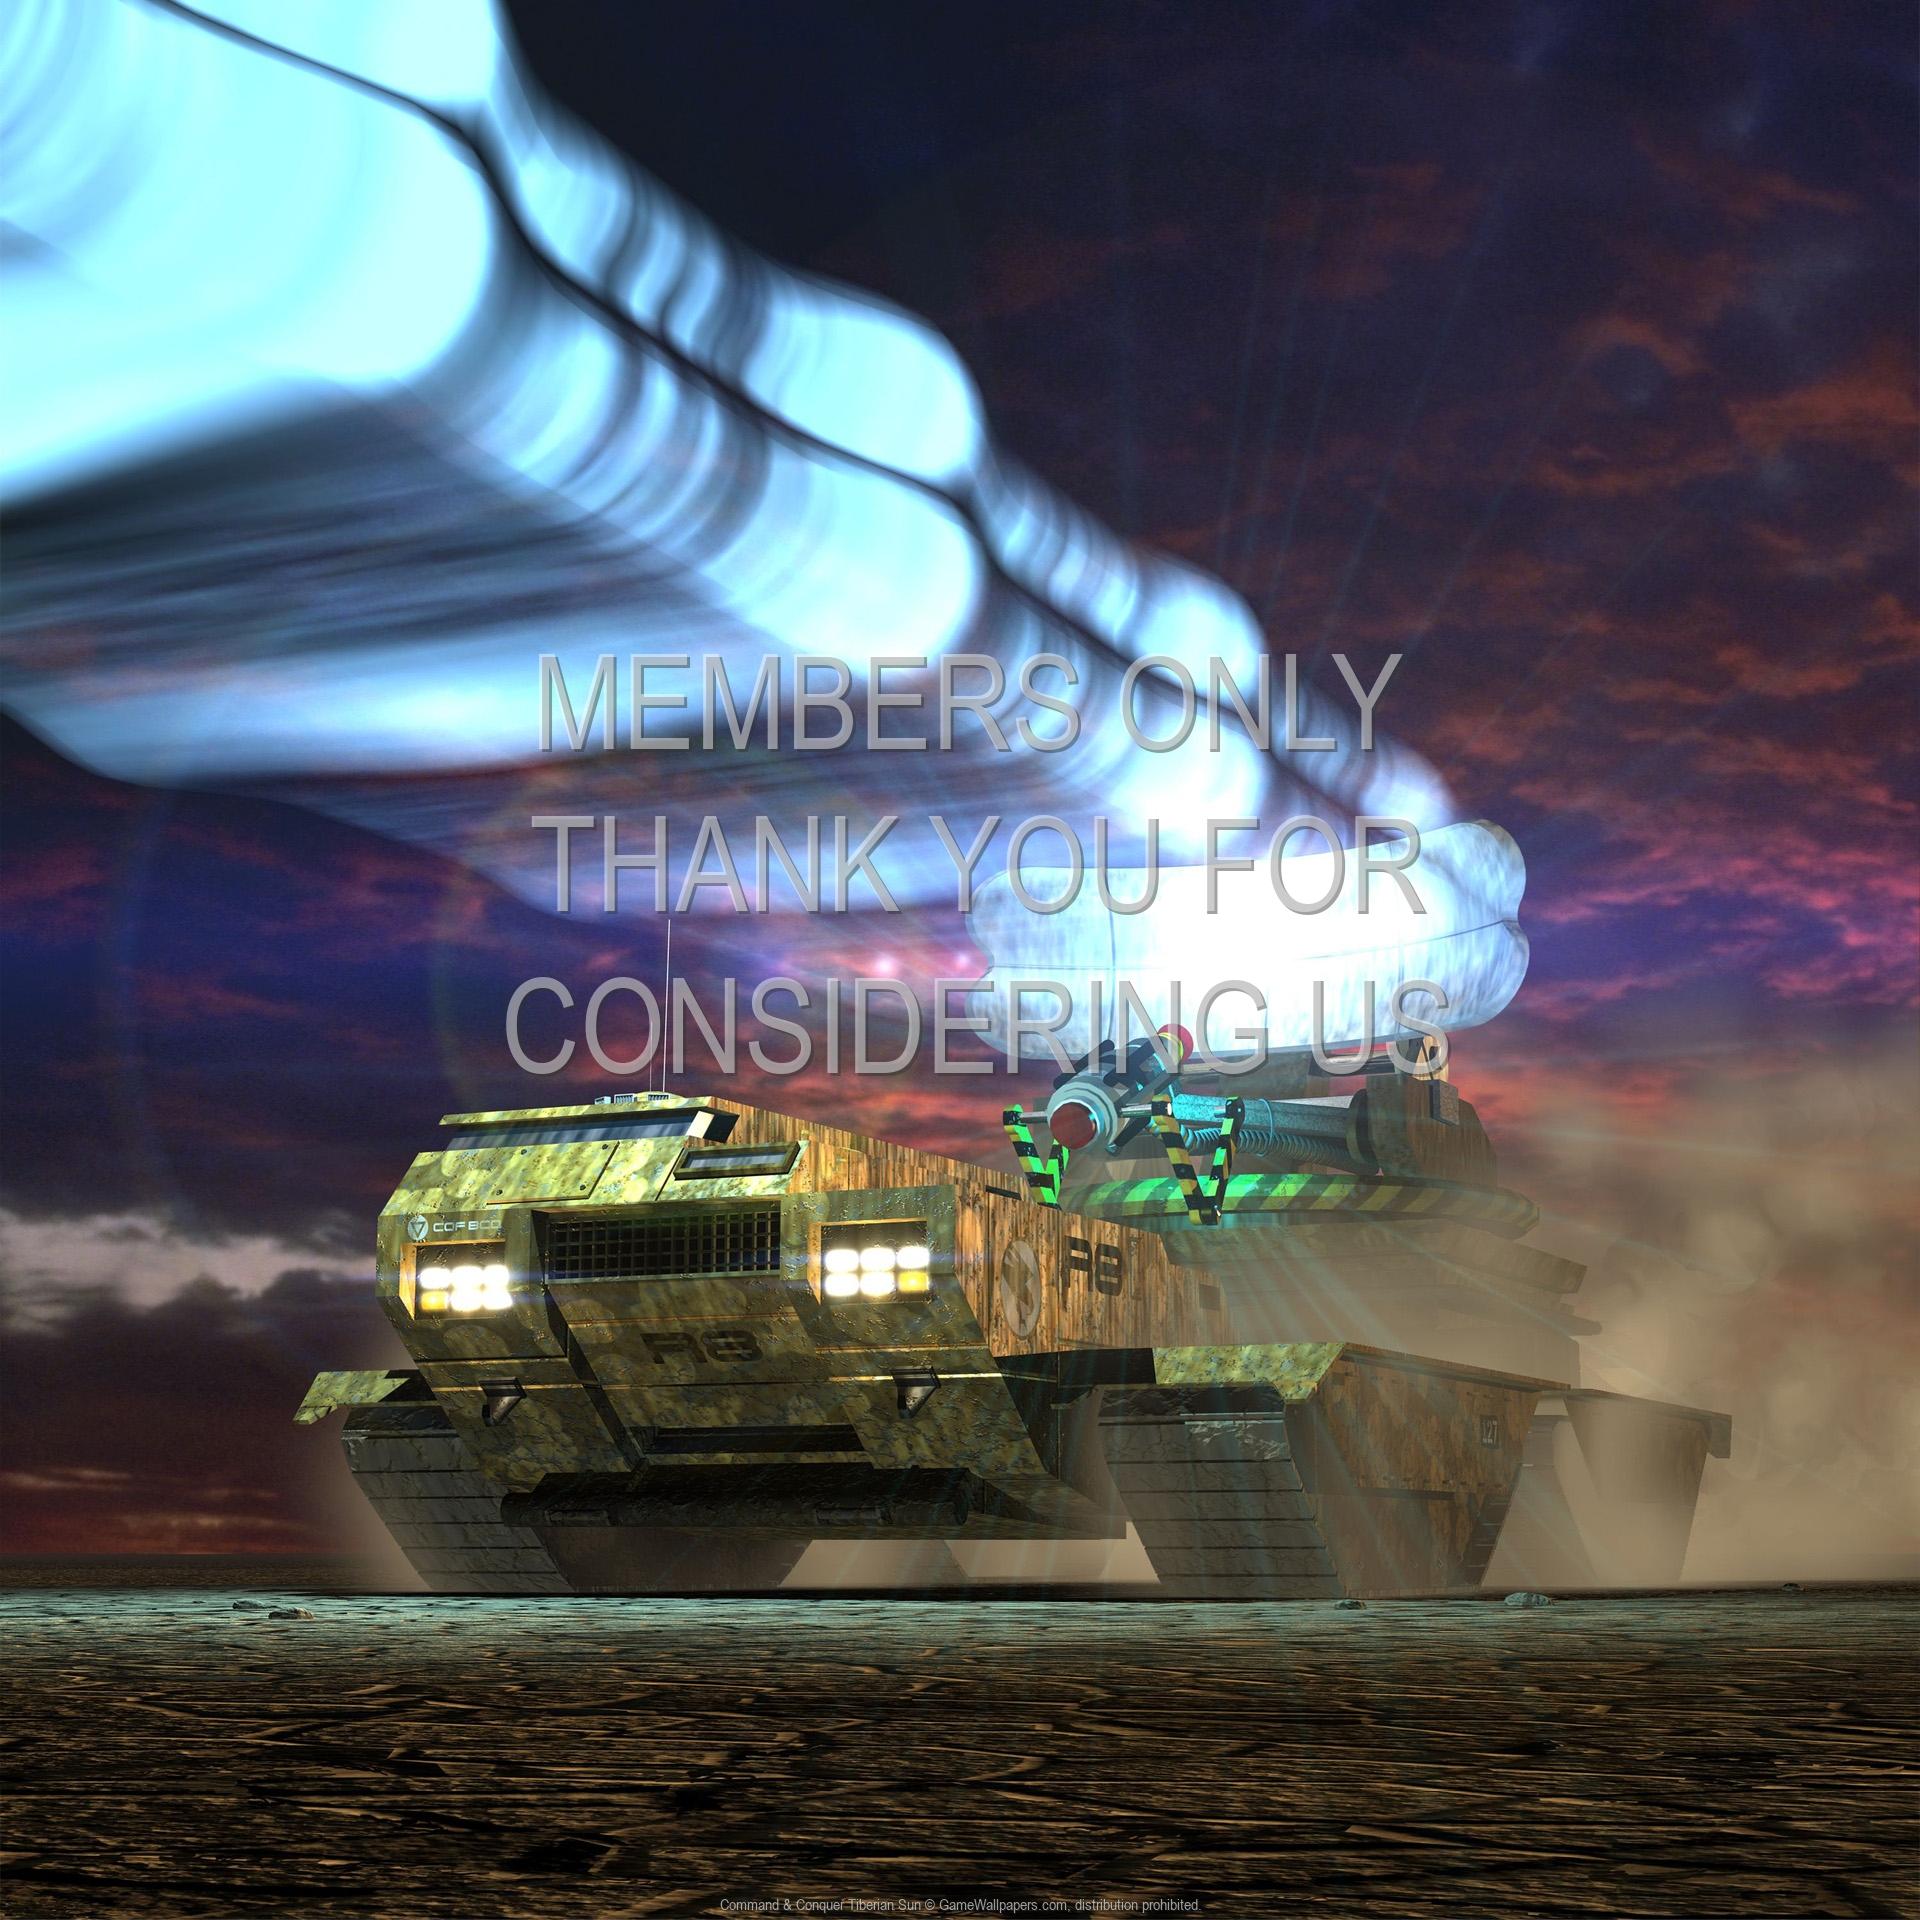 Command & Conquer: Tiberian Sun 1920x1080 Handy Hintergrundbild 01